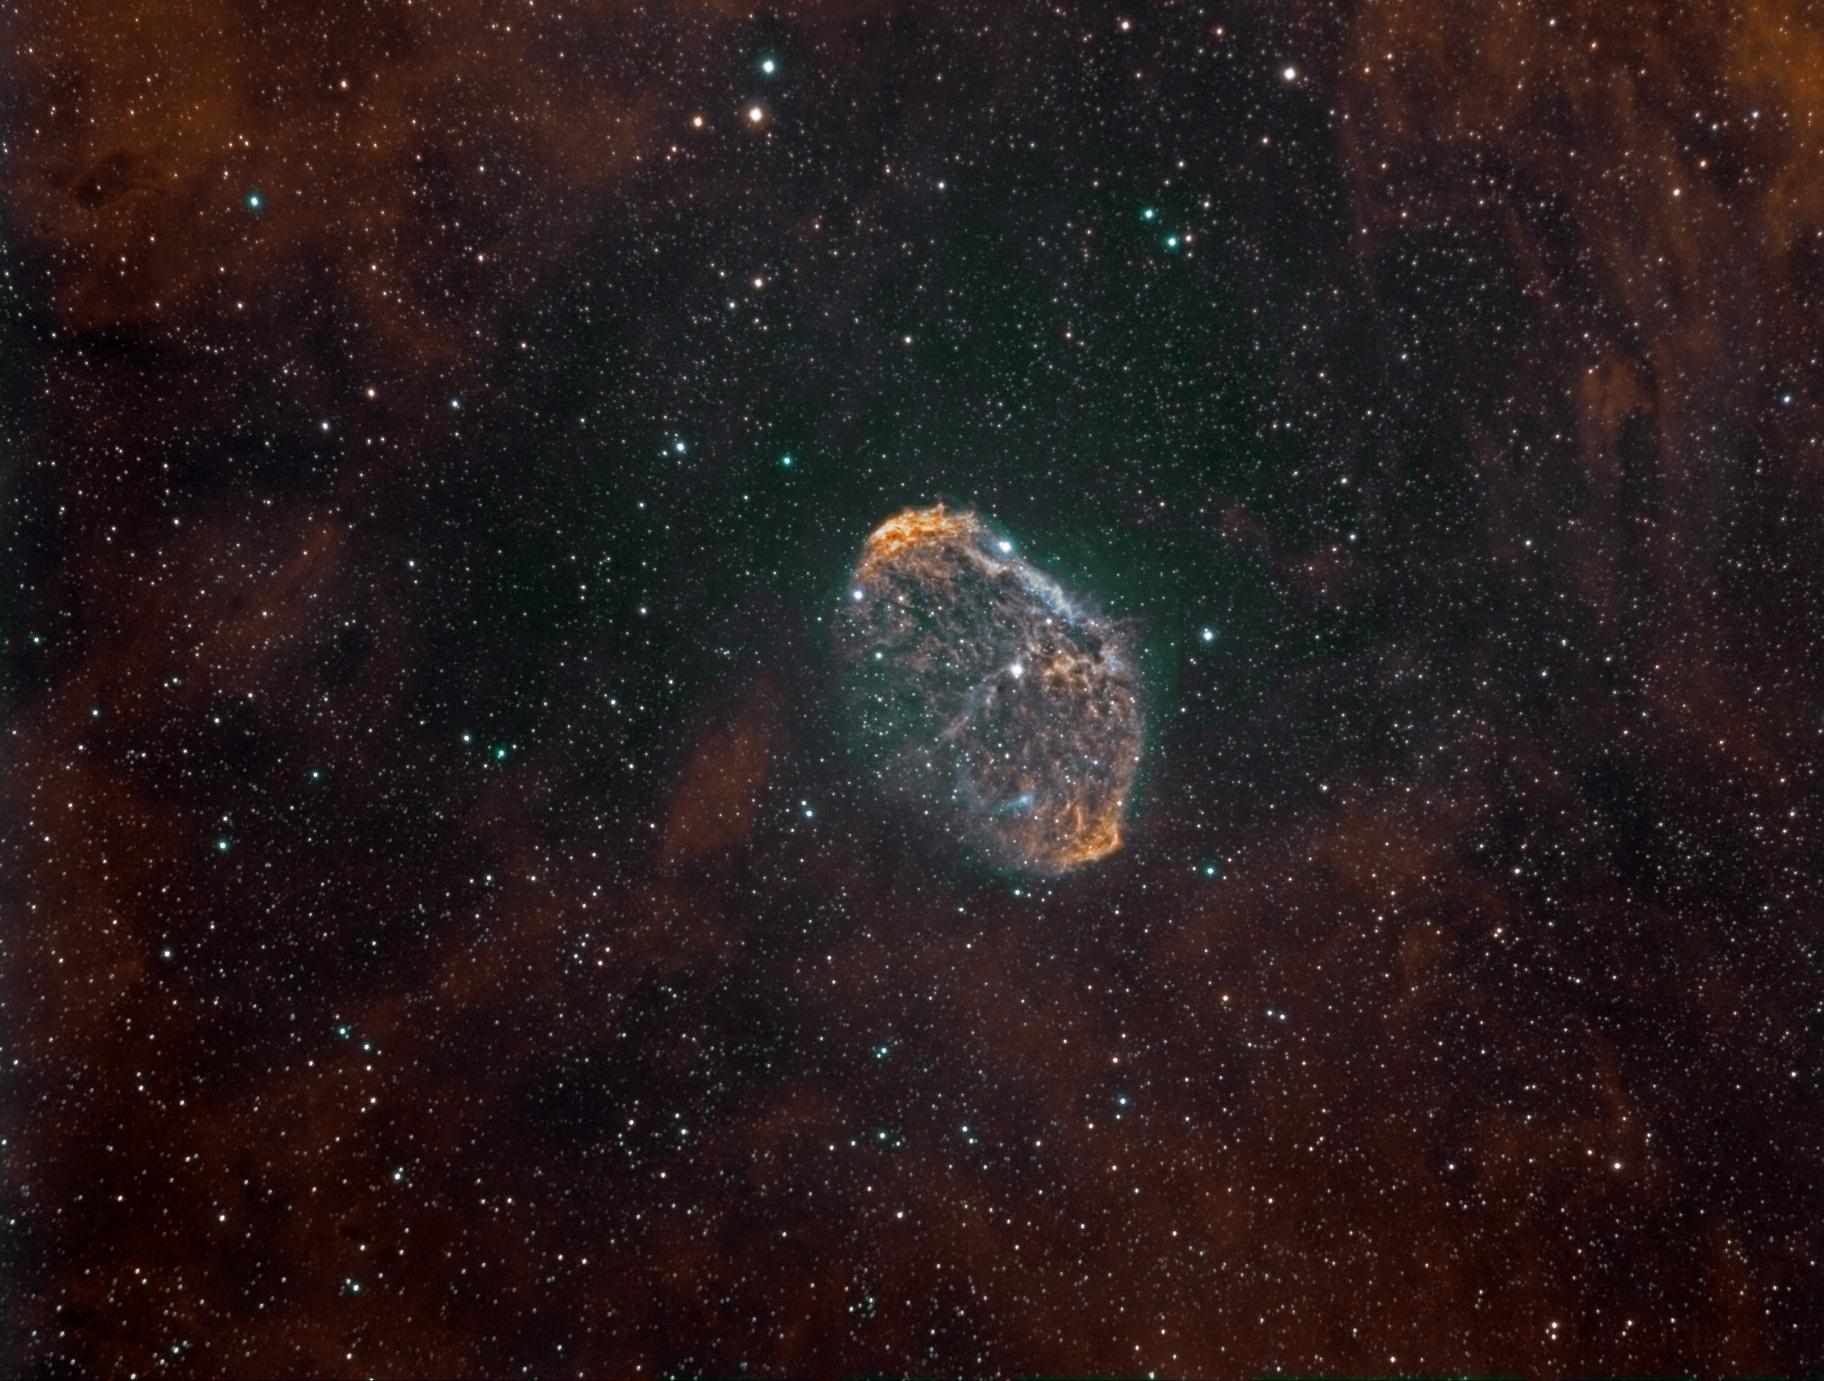 5a08c5be532fa_NGC6888ensho.jpg.9136342ca92d61714af504a9d08a7fed.jpg